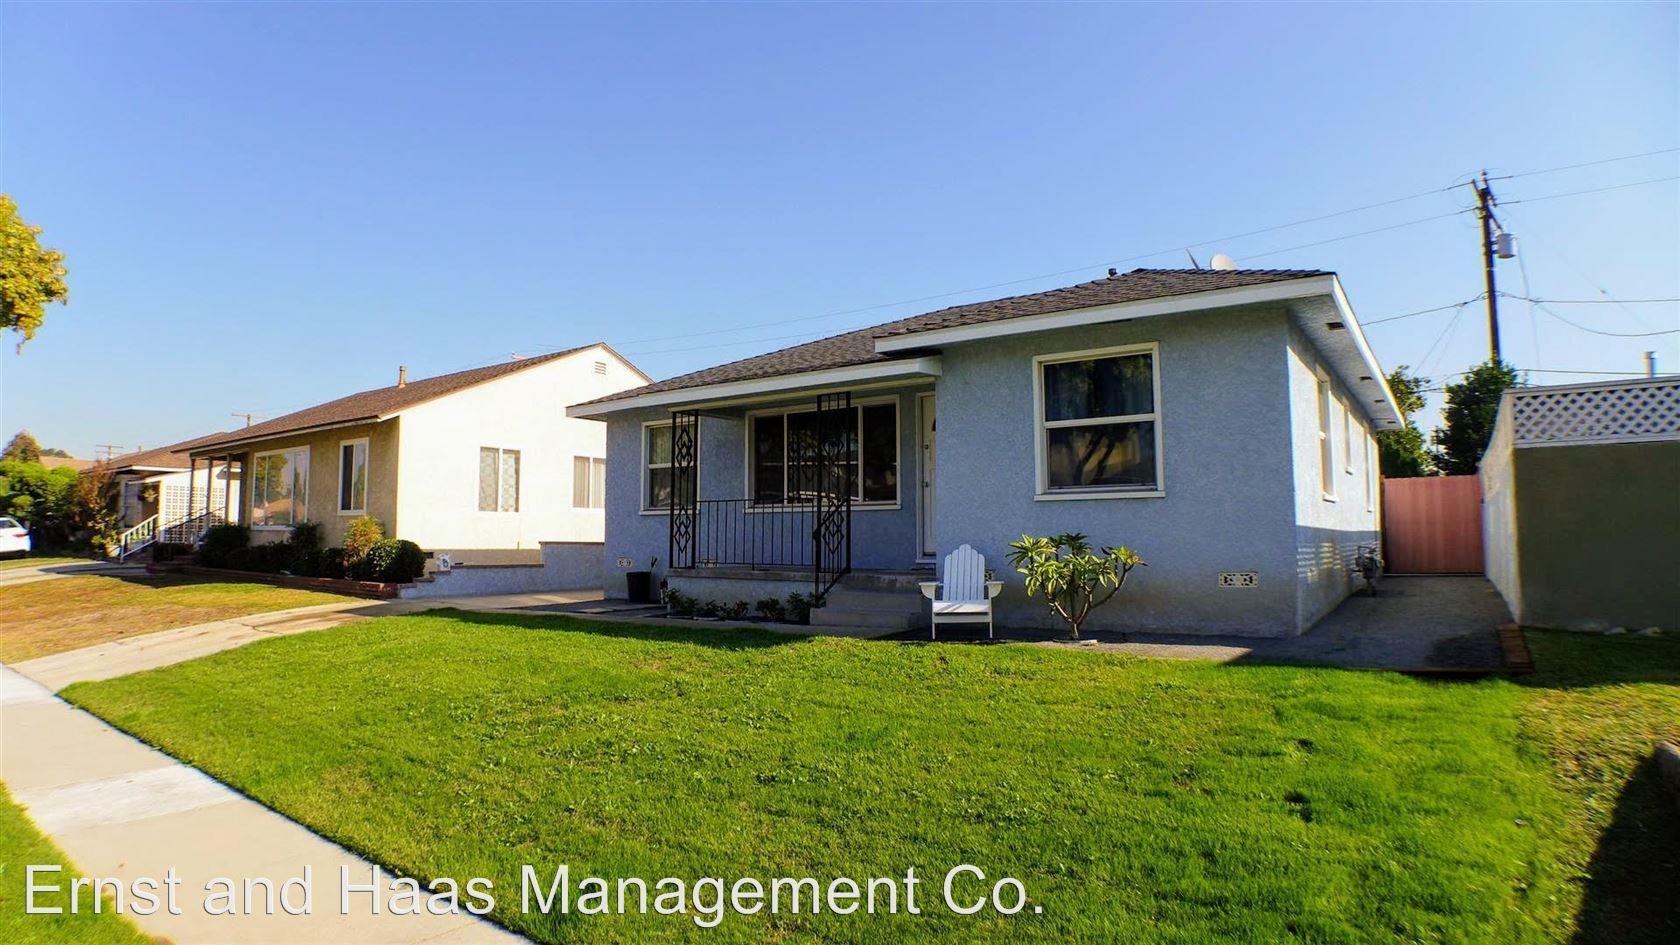 4706 Lomina Ave For Rent - Lakewood, CA | Trulia